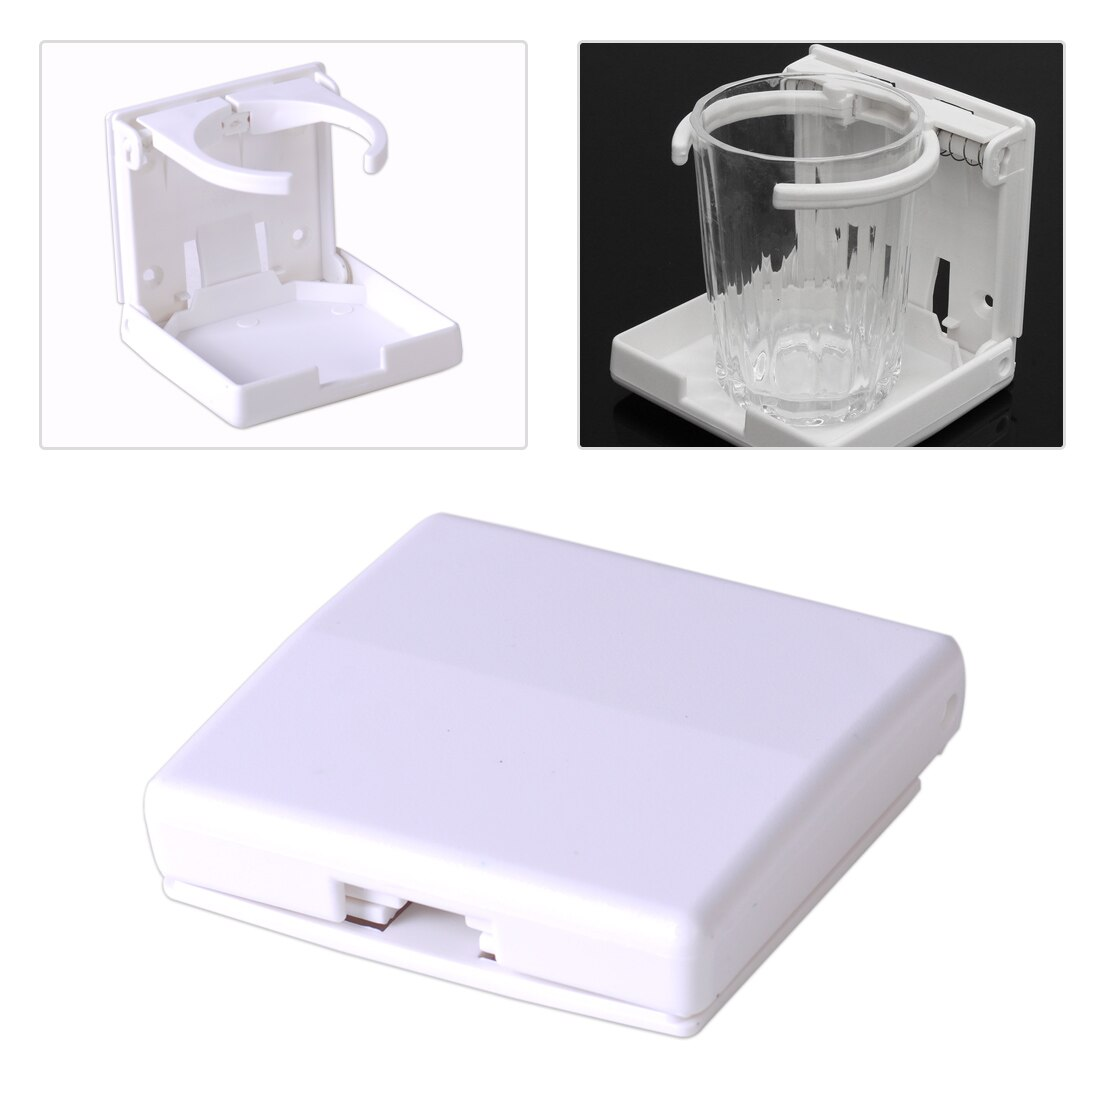 DWCX nueva moda de plástico blanco ajustable plegable bebida agua taza titular de la bebida apto para barco marino caravana yate